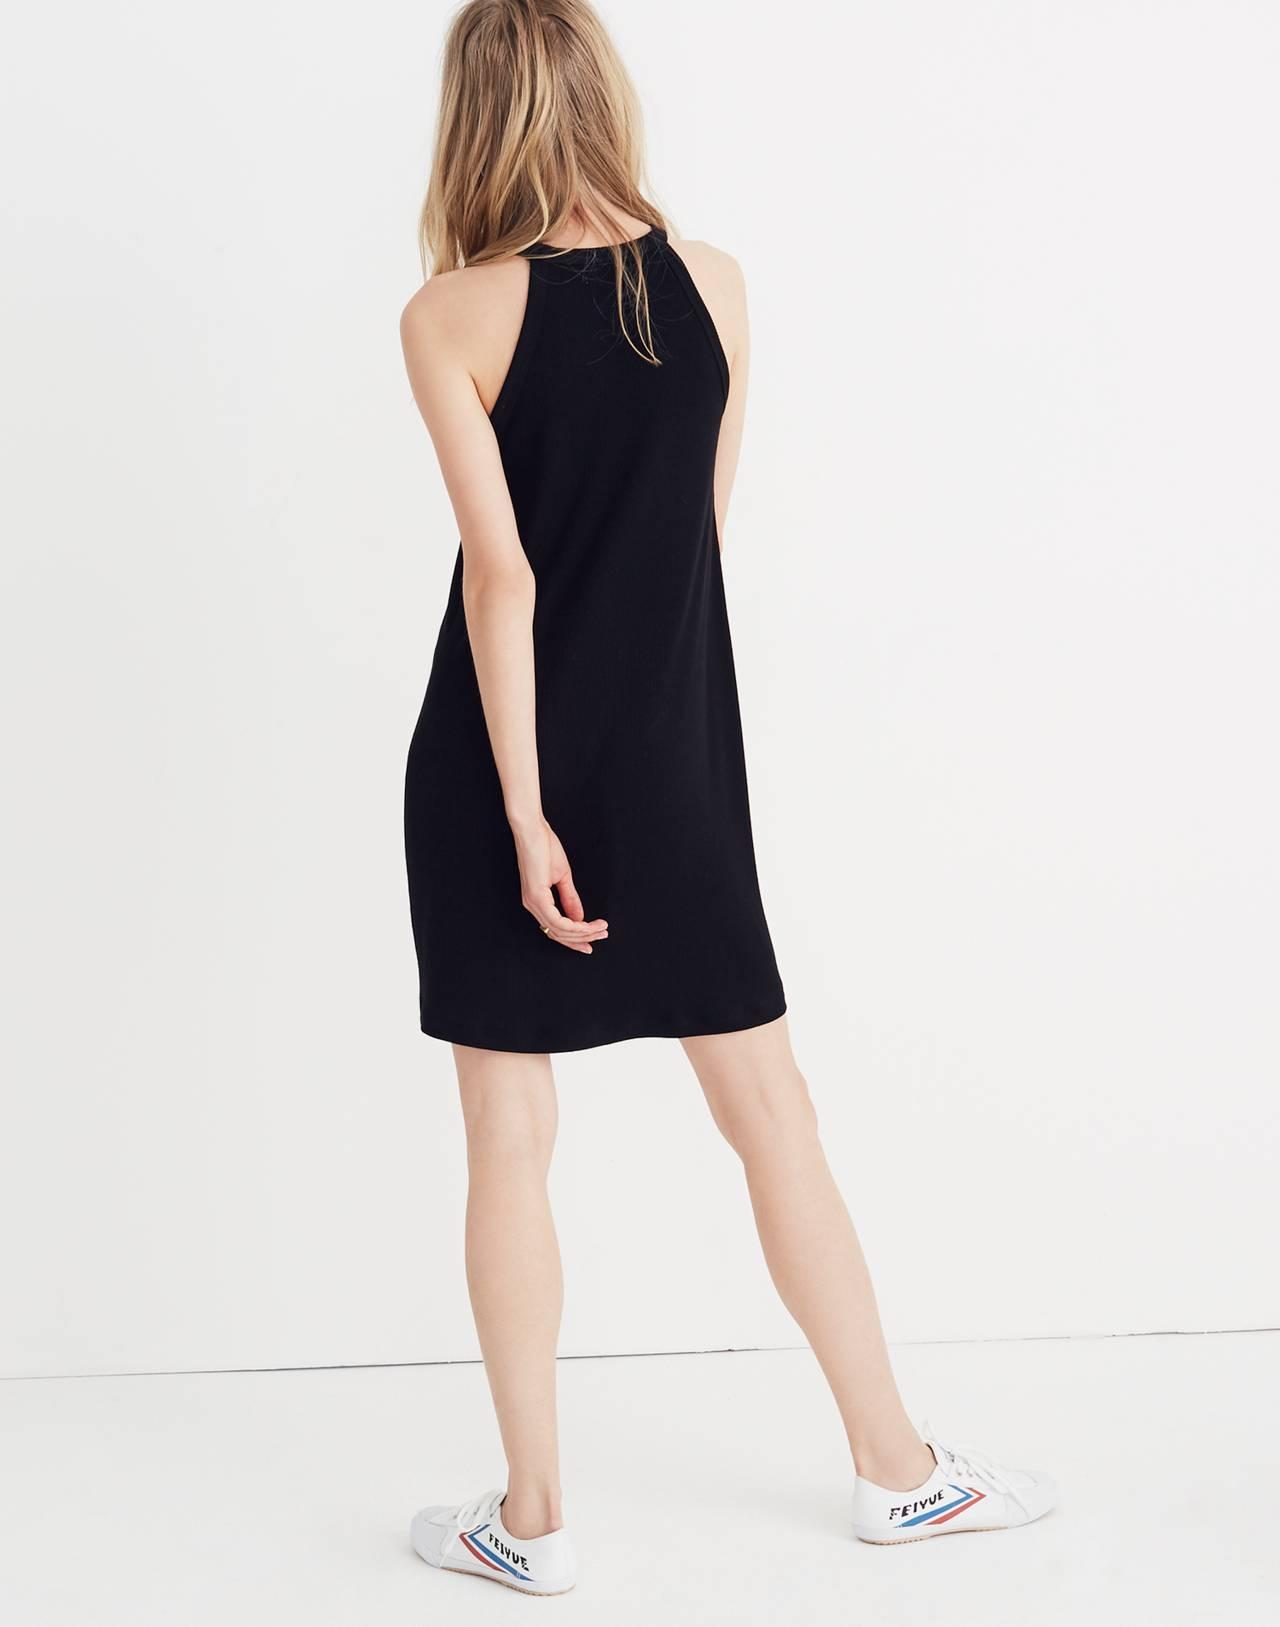 District Dress in true black image 2